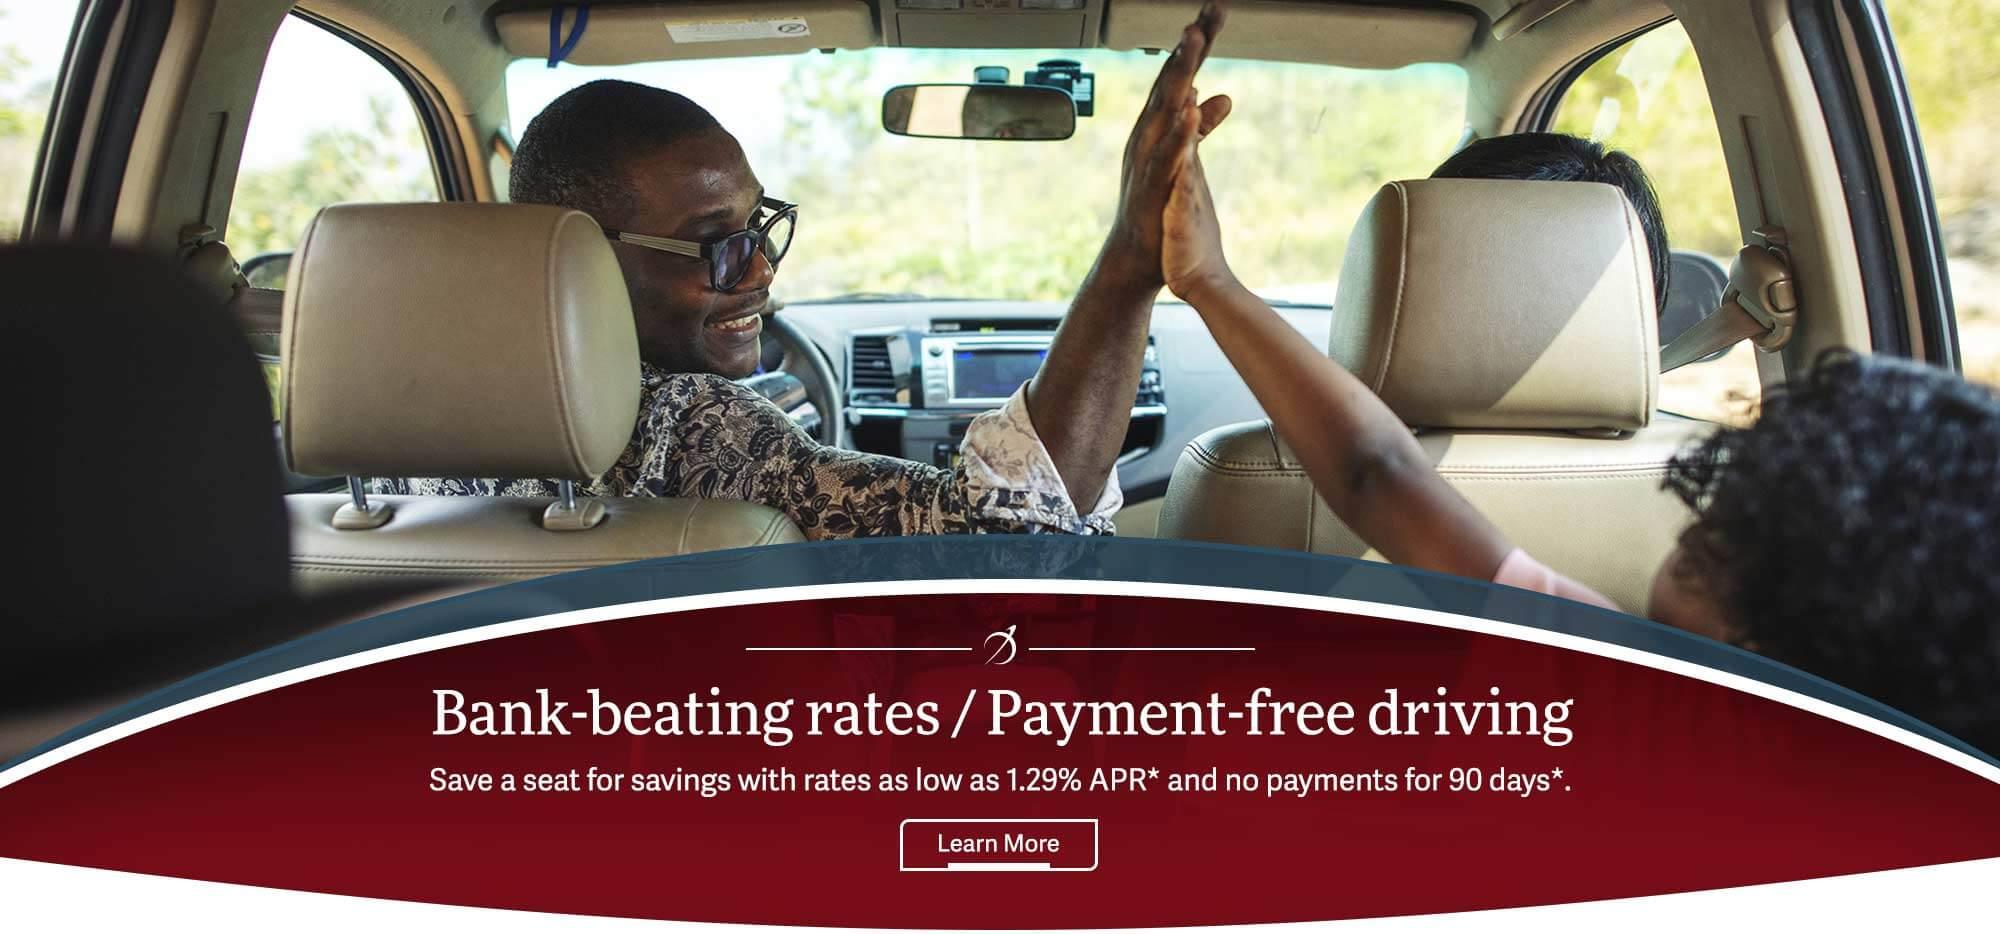 Auto Loans Bank-beating rates